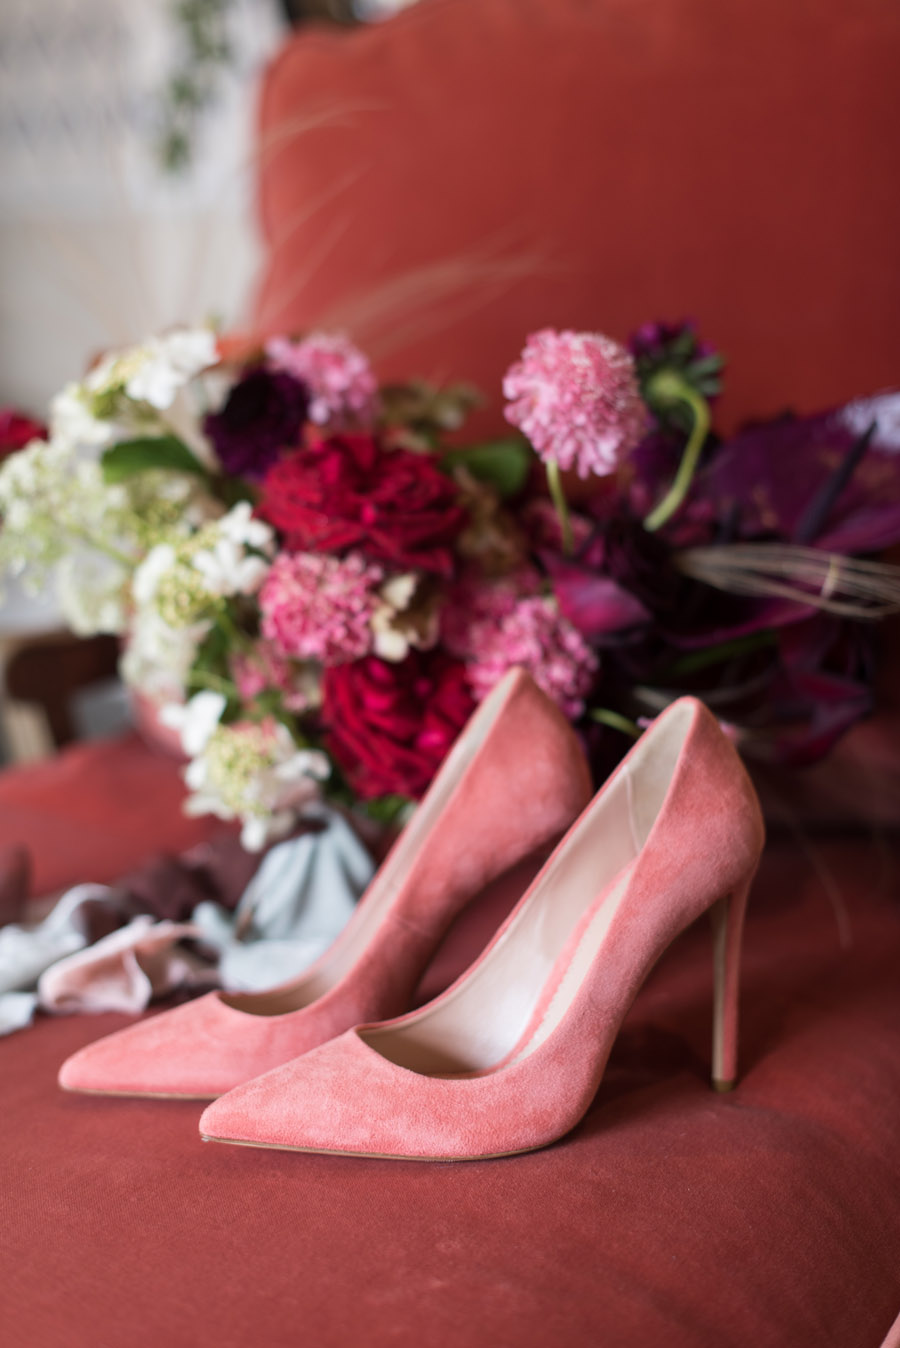 floral wedding ideas at Millbridge Court on English Wedding - photo credit Julie Michaelsen Photography (27)